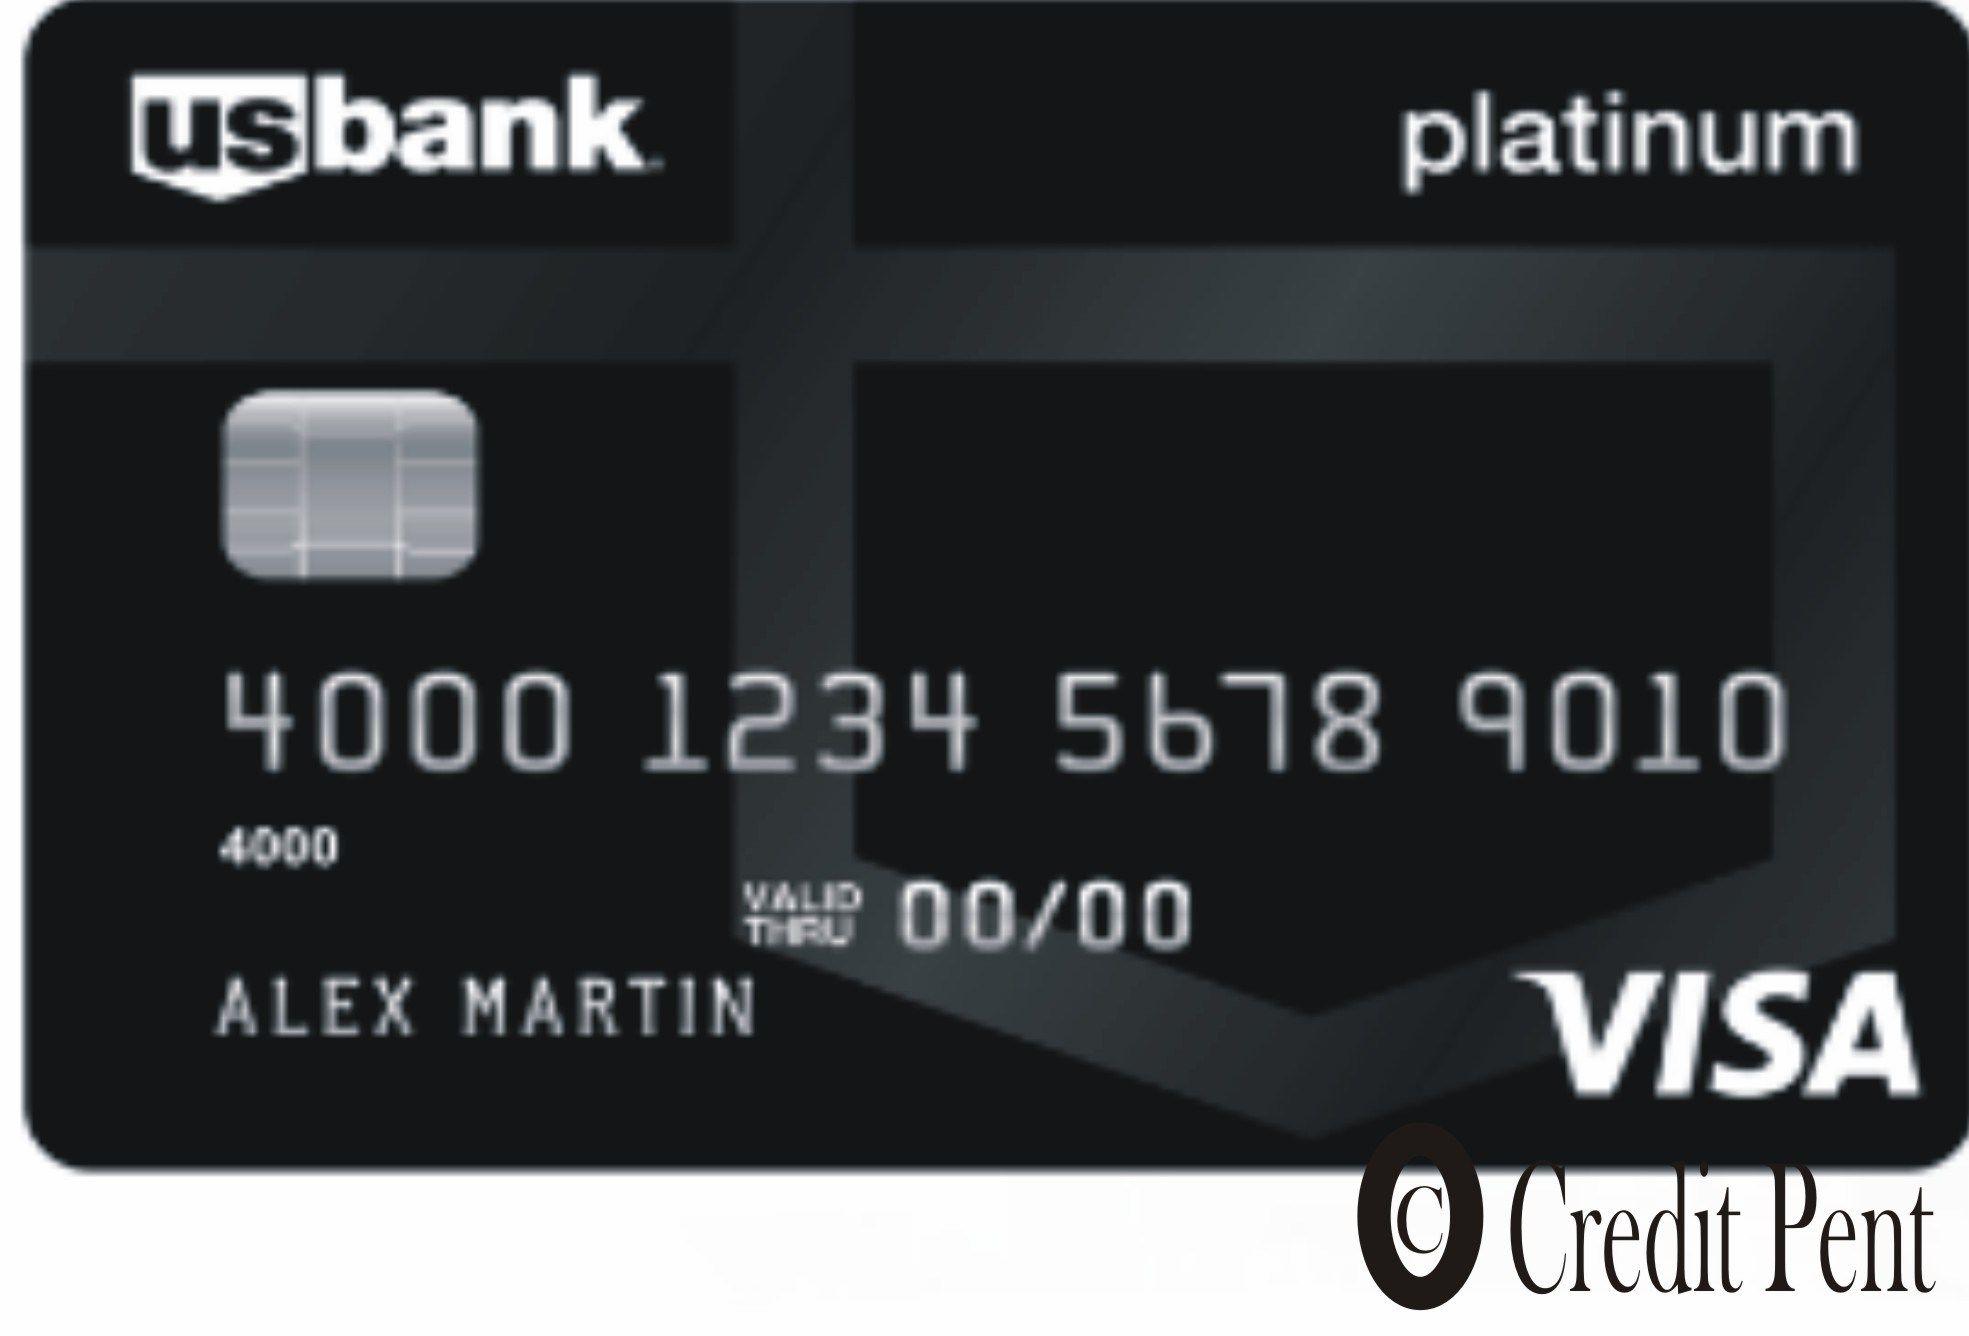 Us bank card credit login visa platinum card limit rewards us bank card credit login visa platinum card limit rewards publicscrutiny Gallery